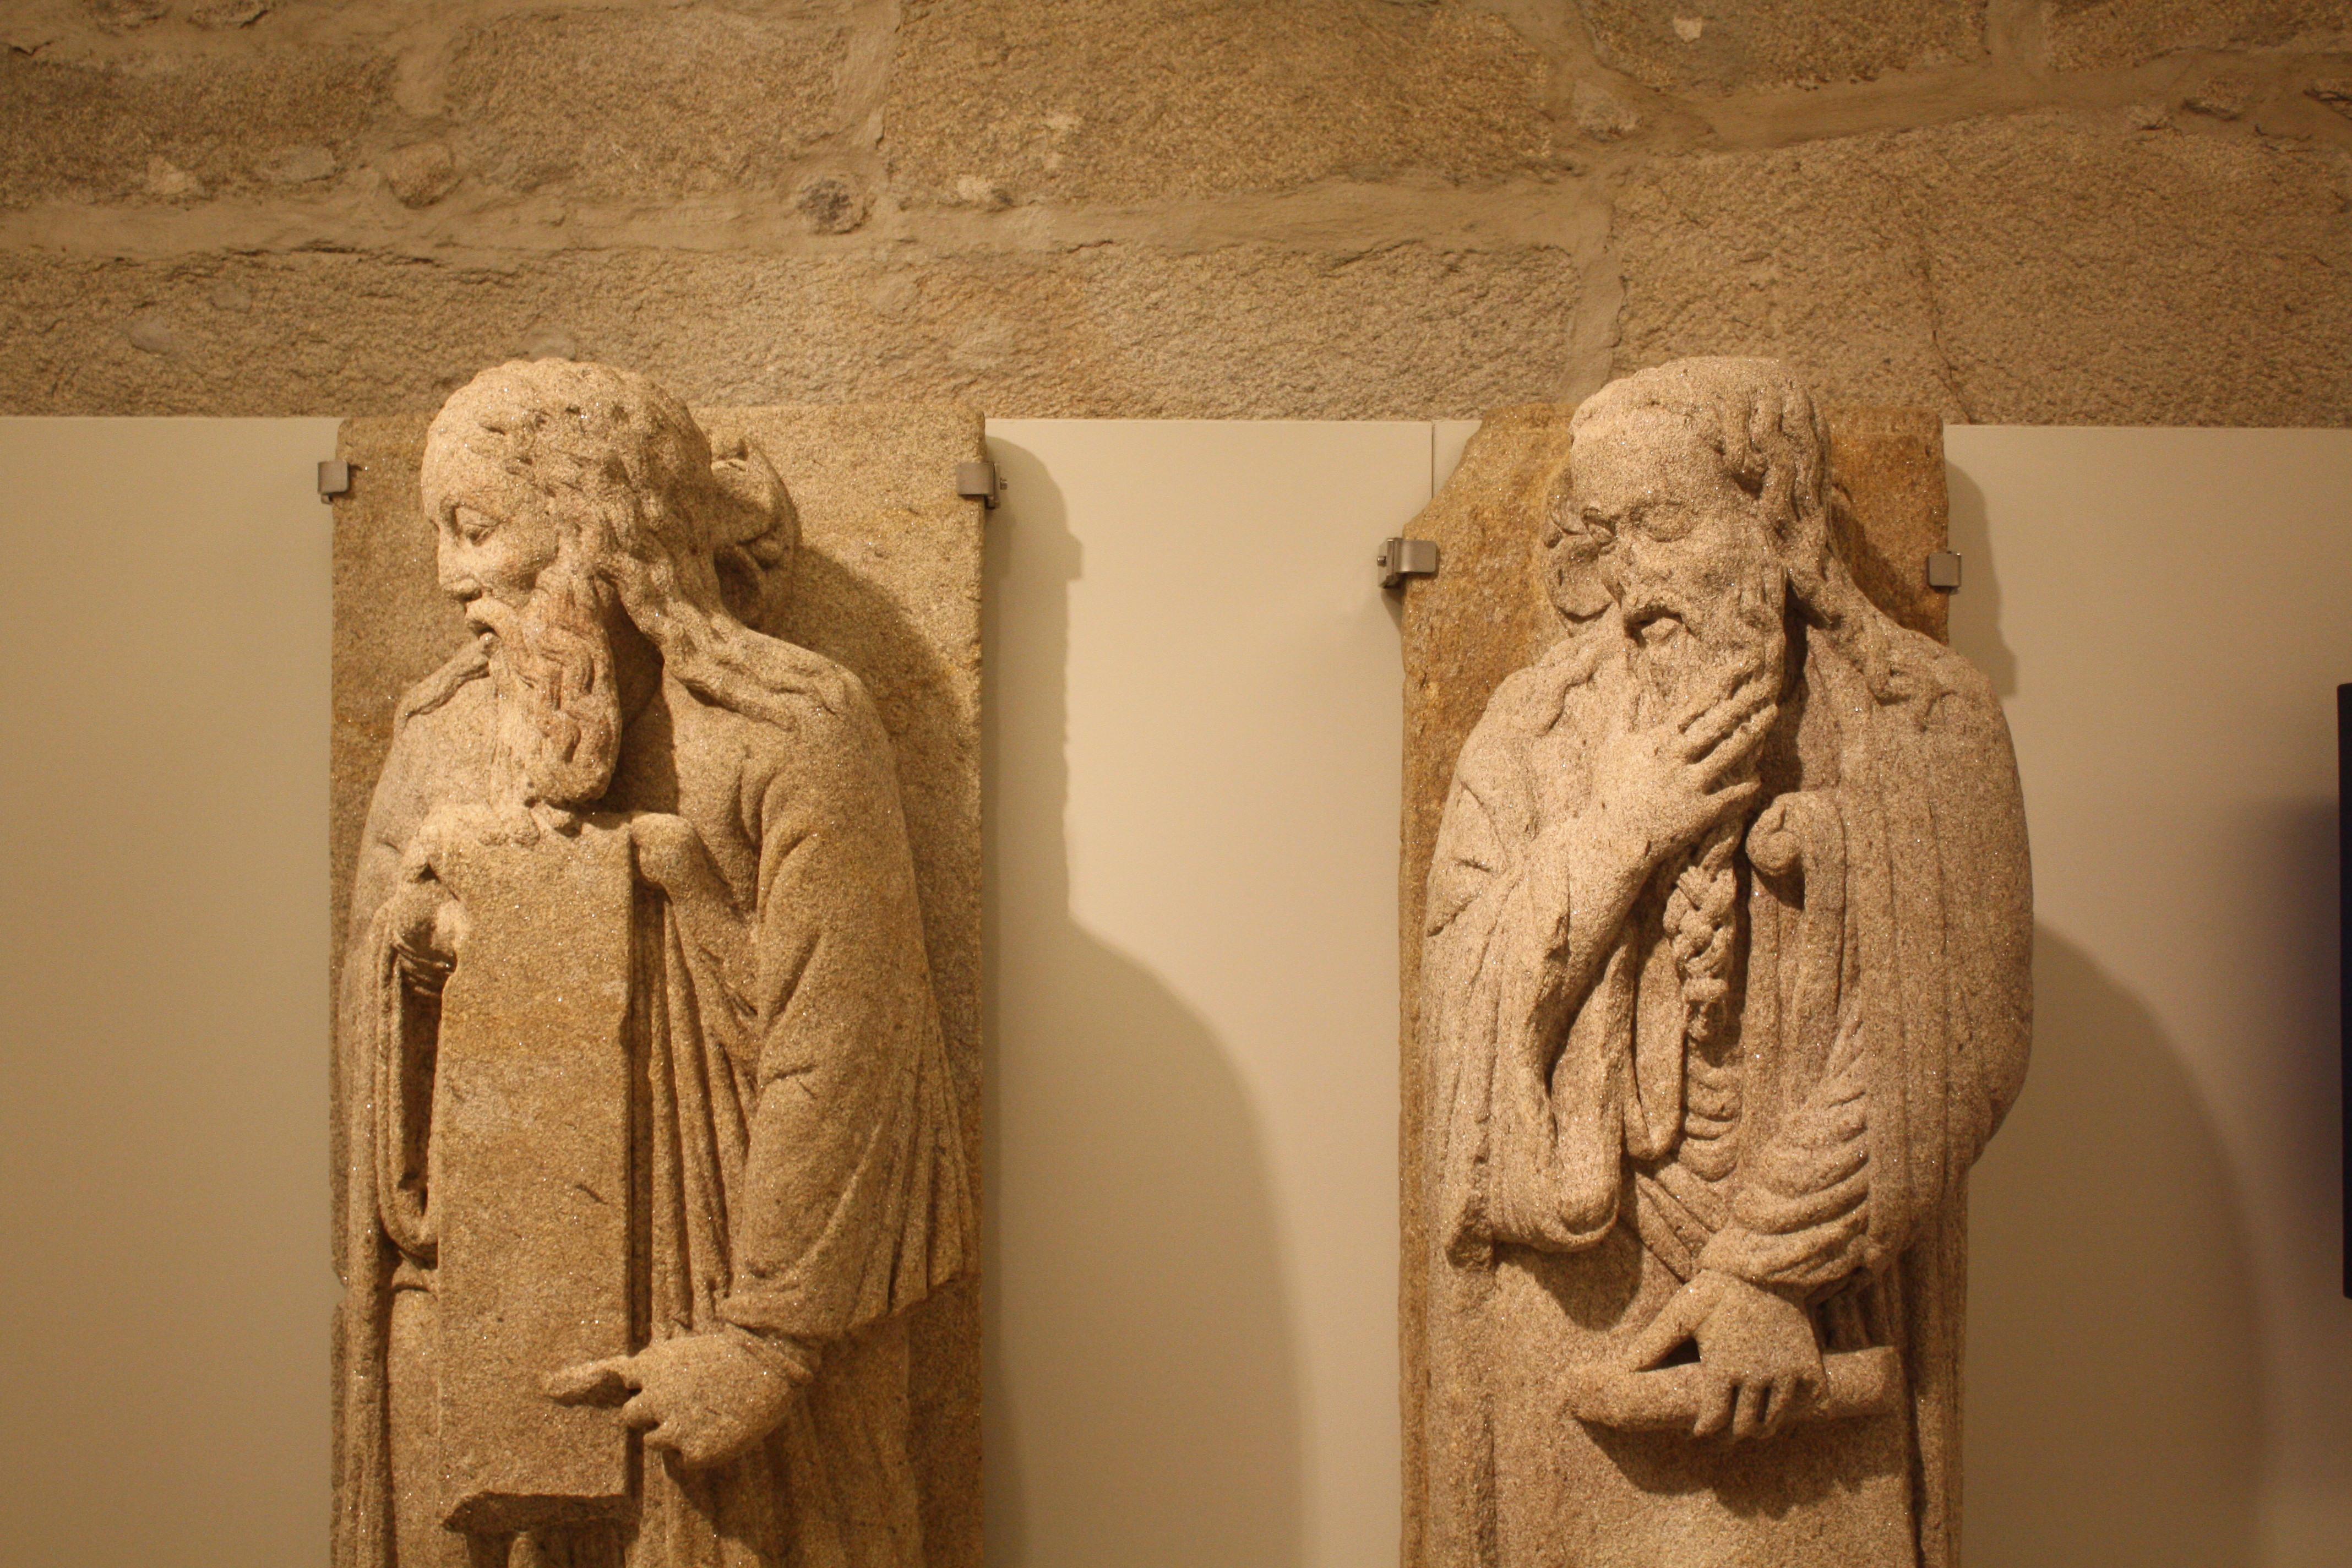 File:Museo Pontevedra, Ed. Sarmiento 02-29a.JPG - Wikimedia Commons